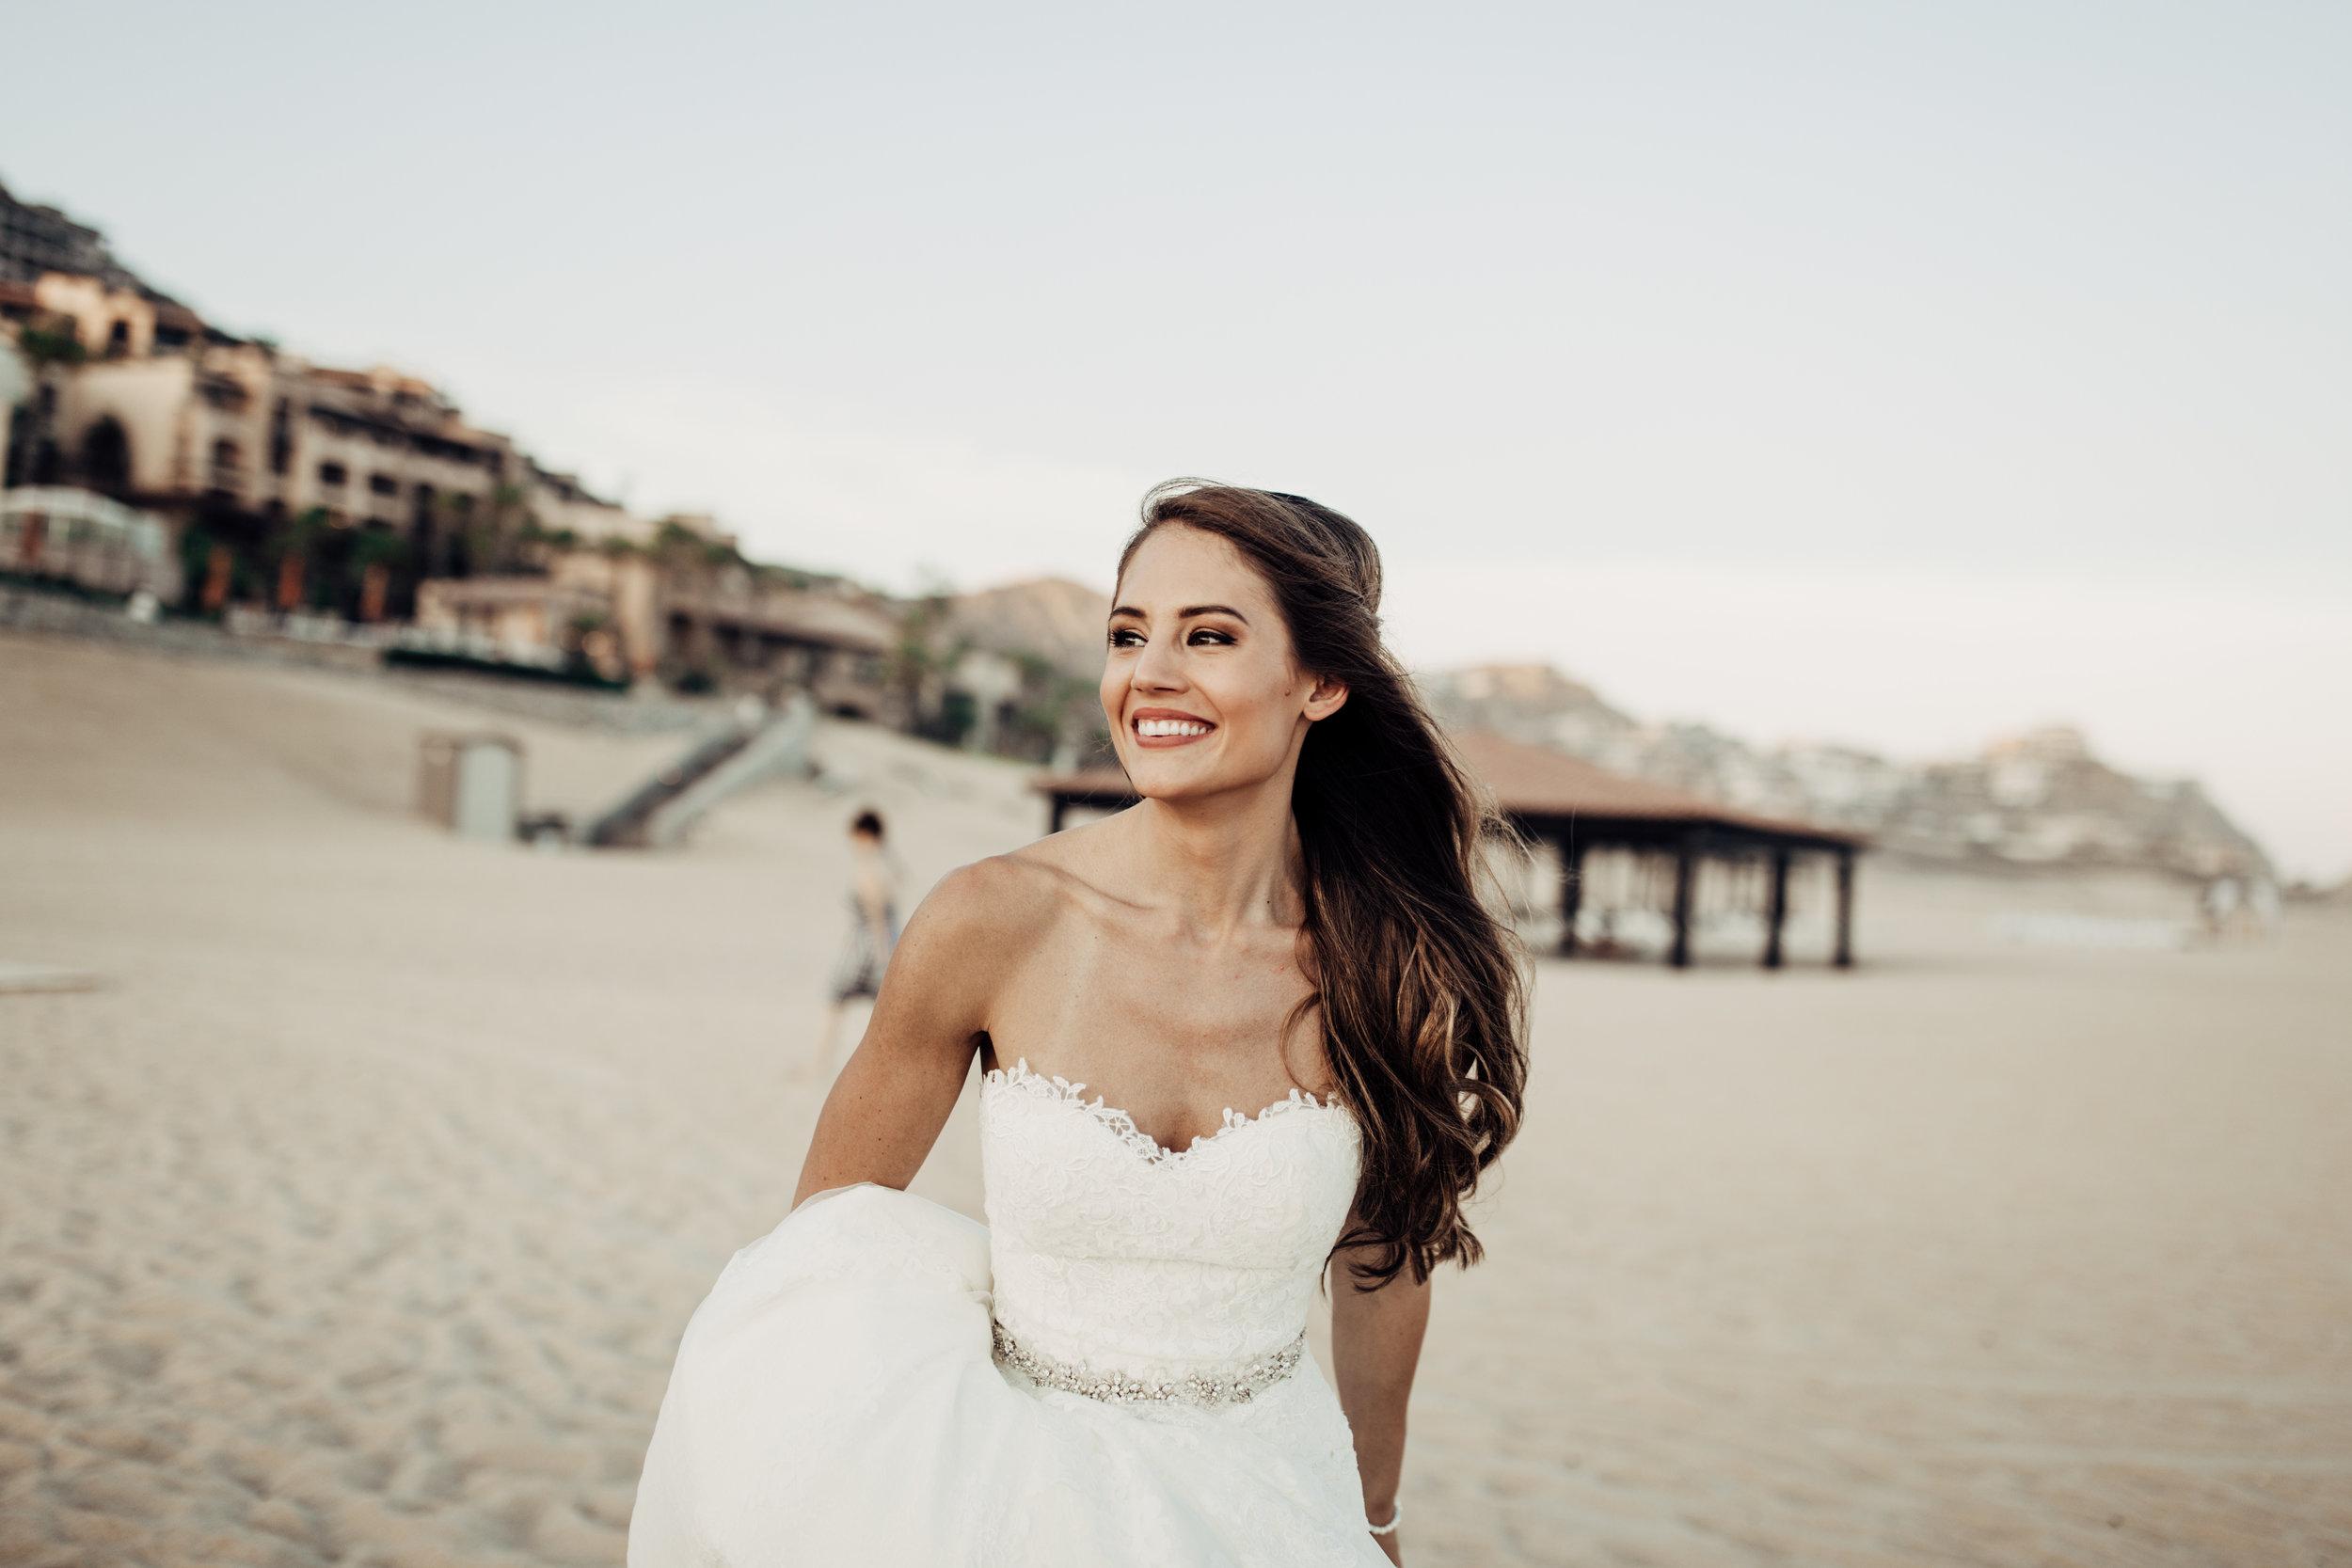 pueblo-bonito-sunset-beach-wedding-cabo-san-lucas481.jpg